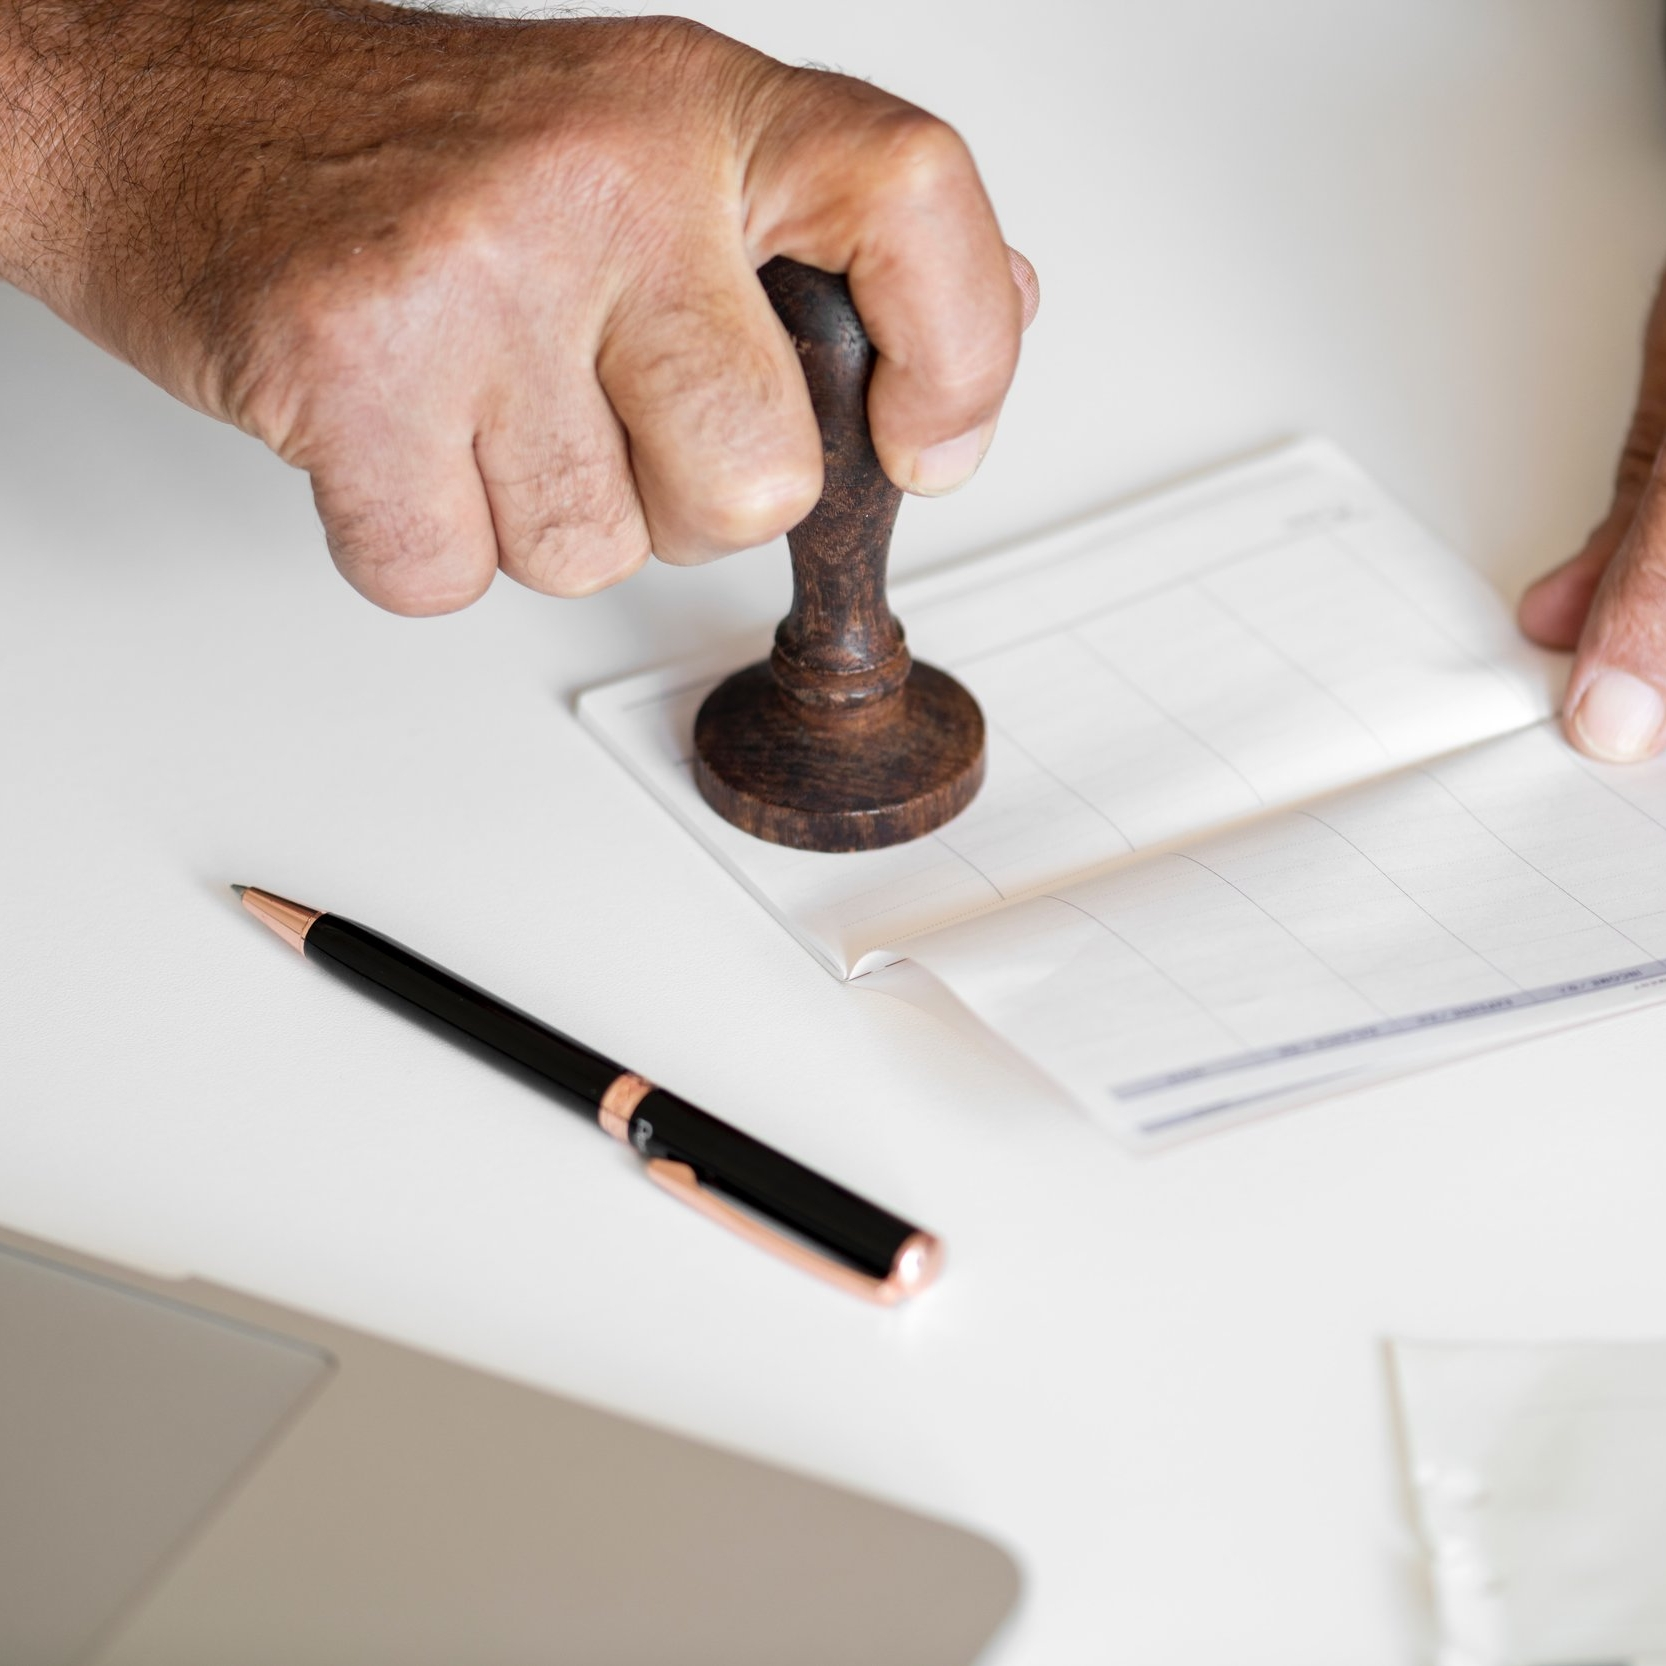 JOB DESCRIPTION TEMPLATES AND DOWNLOADS -